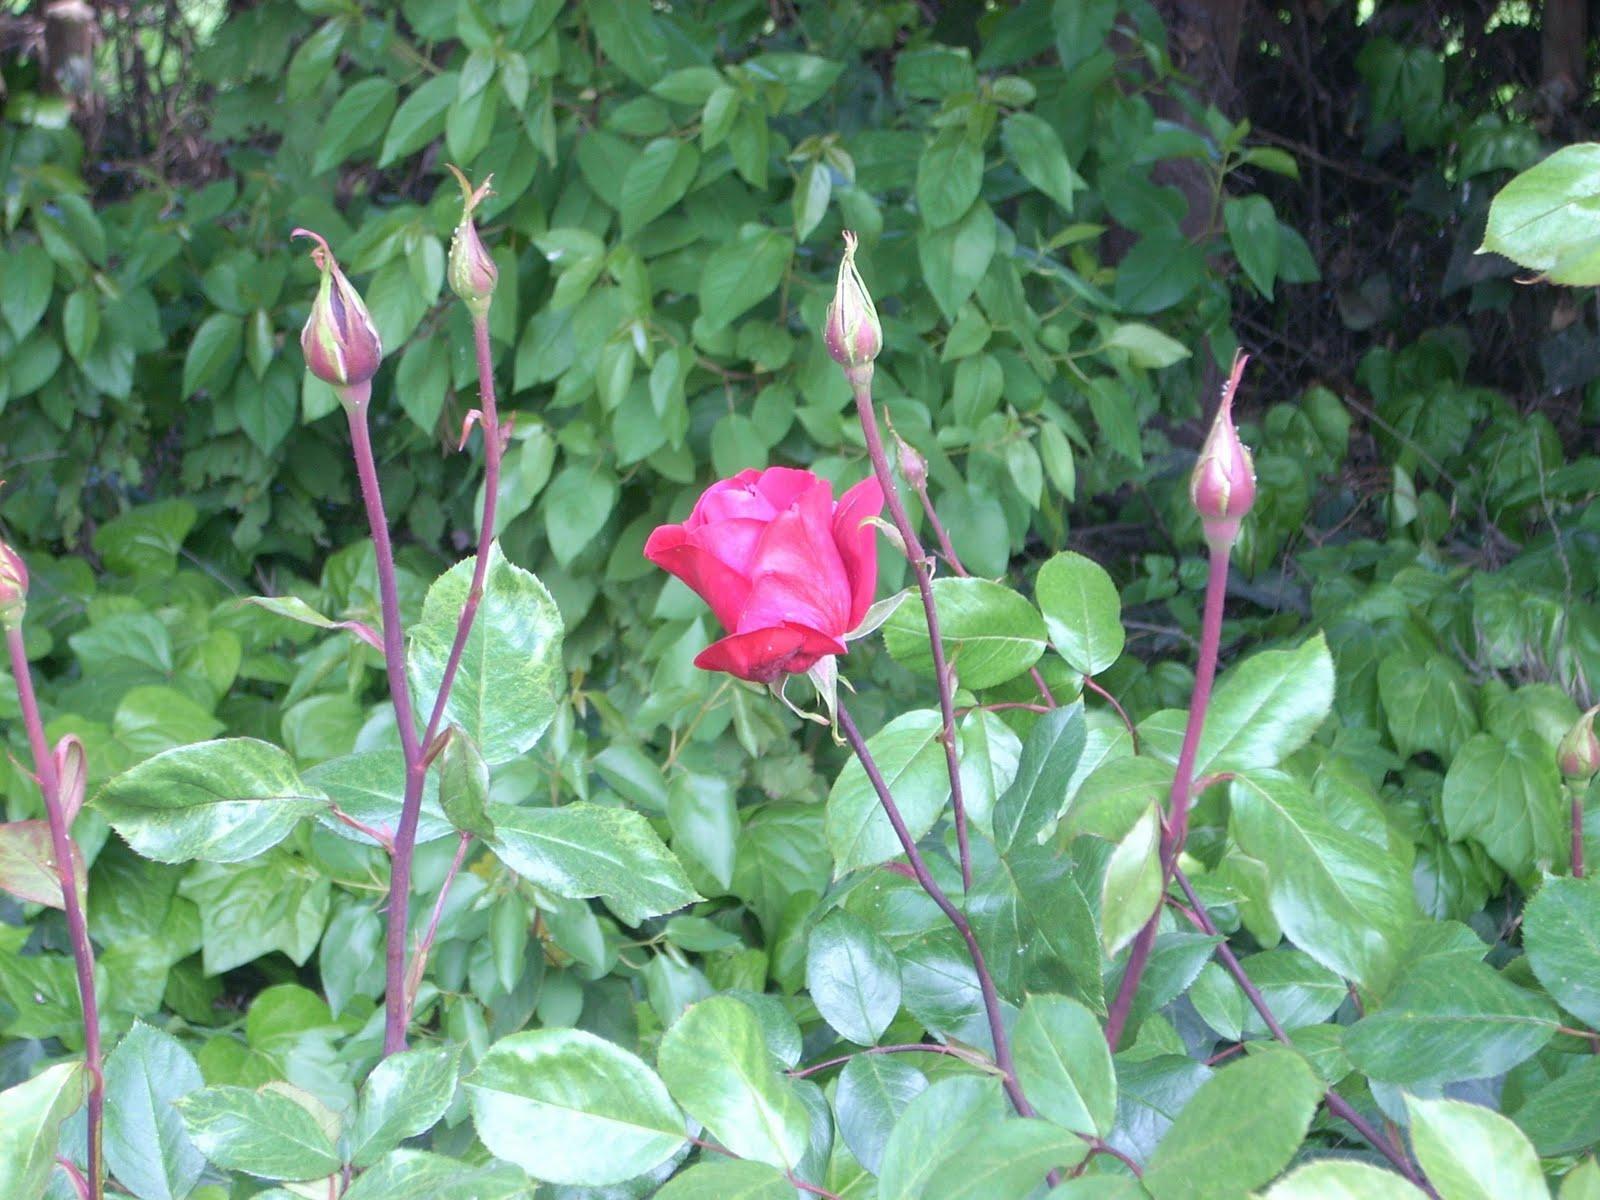 Mar a elena en lonqu n mi jard n silvestre my wild garden for Viveros en lonquen